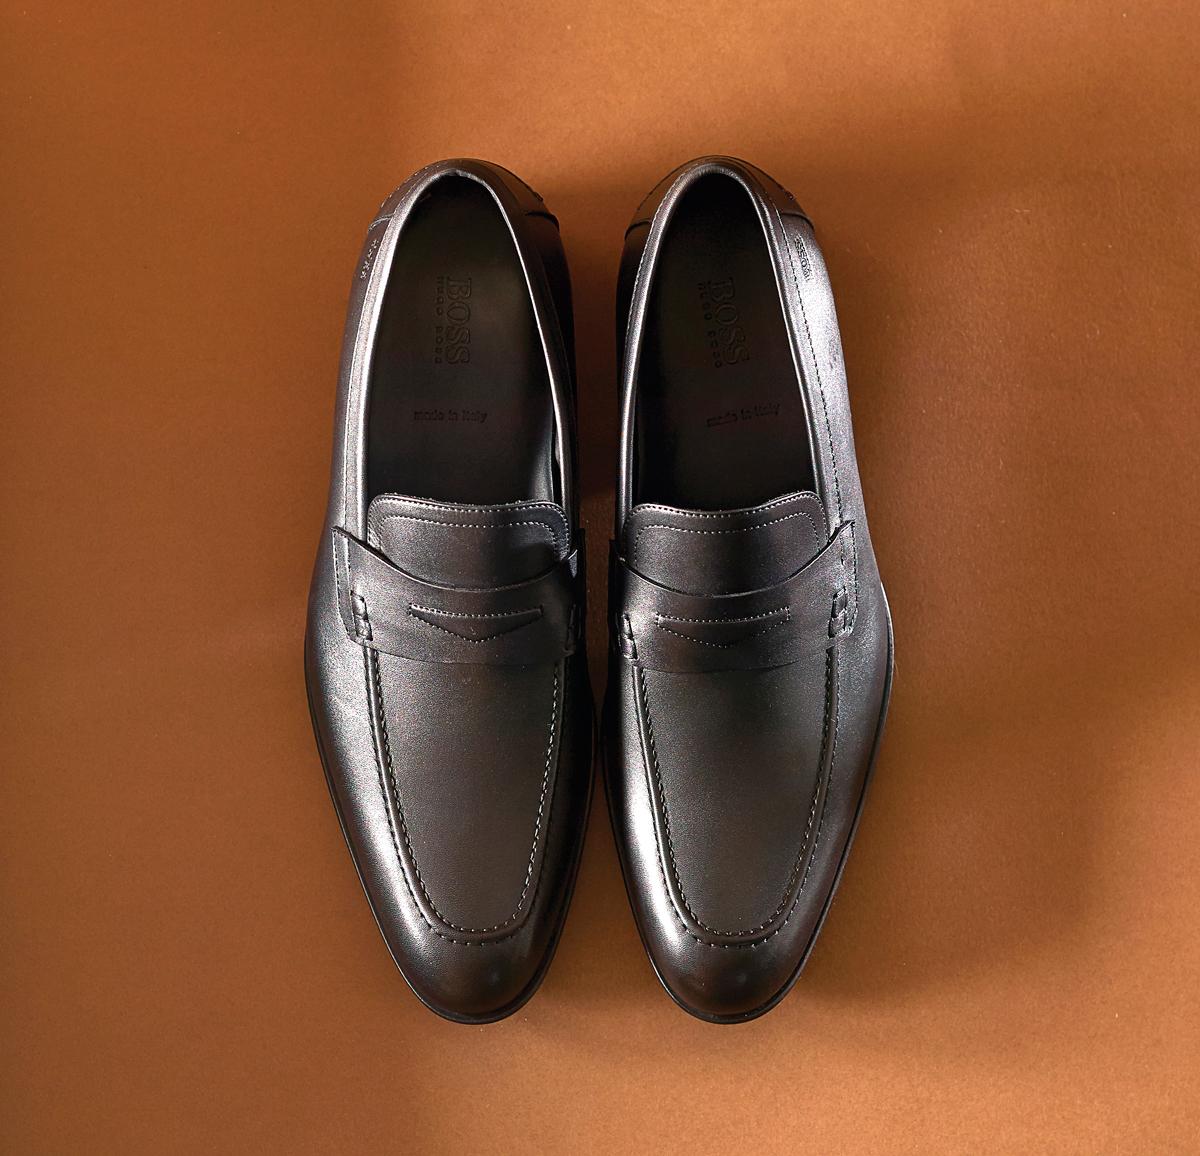 m13-accessoires-lui-chaussures-sorti-hugo-boss